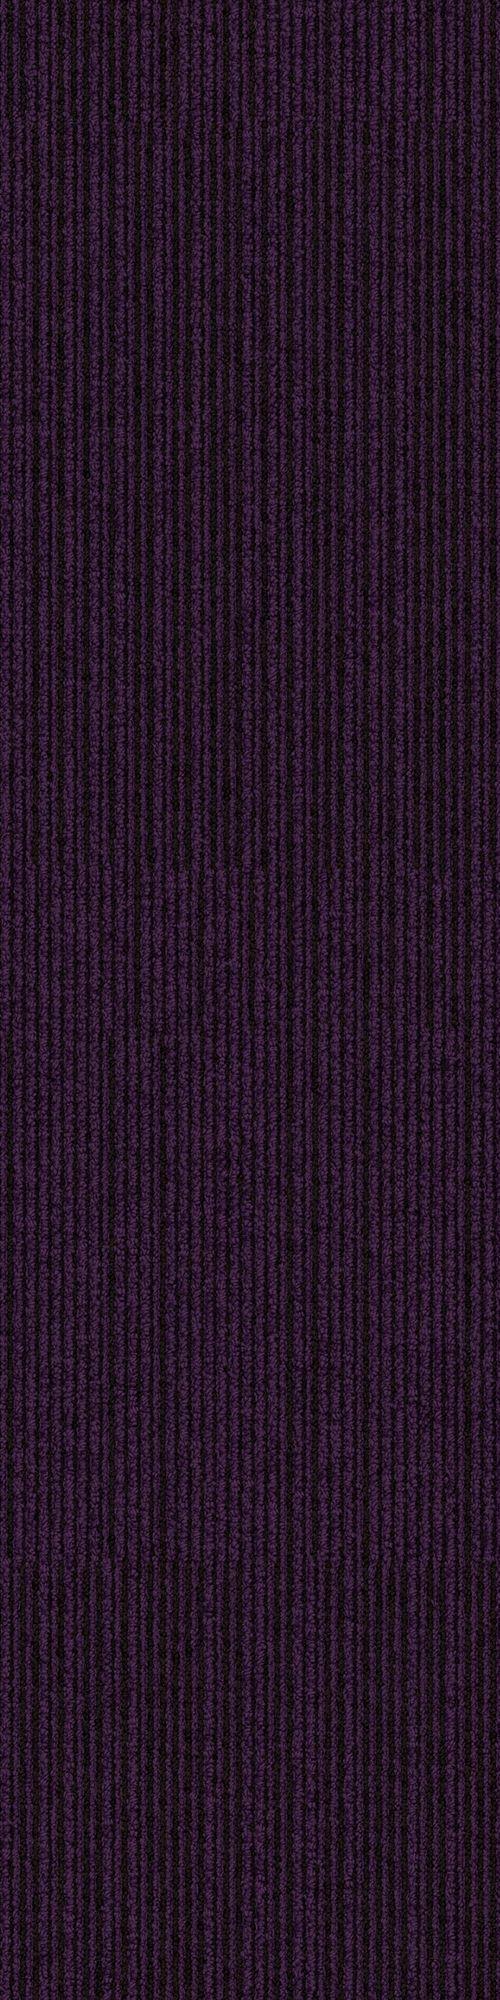 Interface carpet tile: On Line Color name: Purple